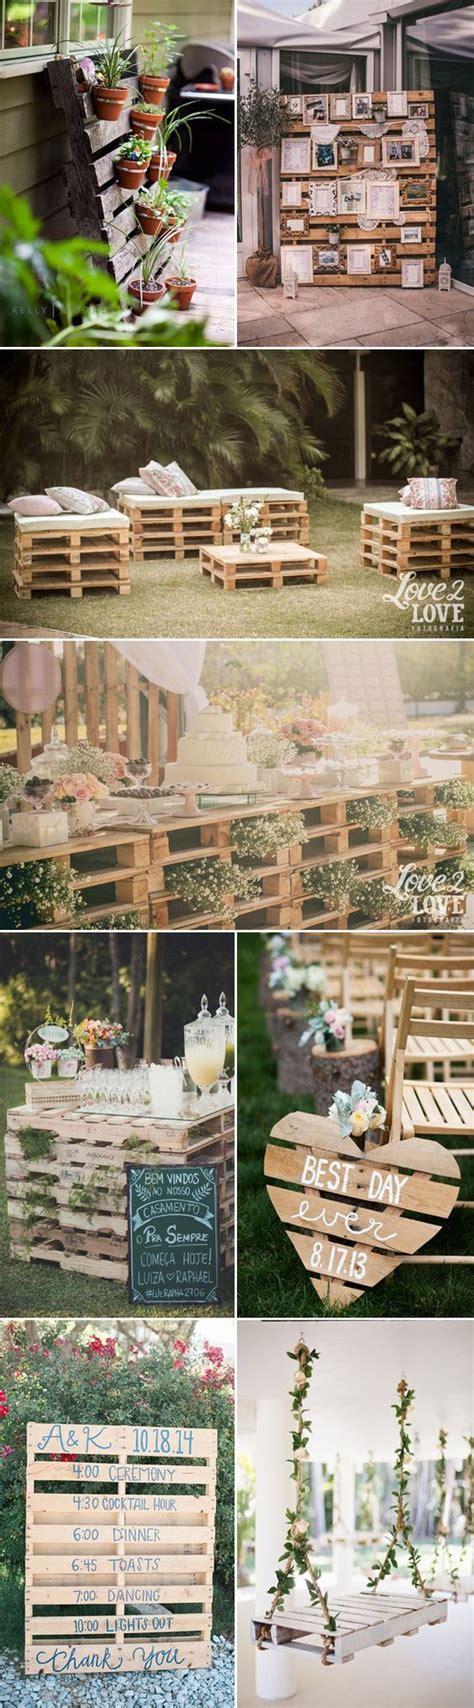 Pallet Wedding Decor 25 Best Ideas About Pallet Wedding On Pinterest Country